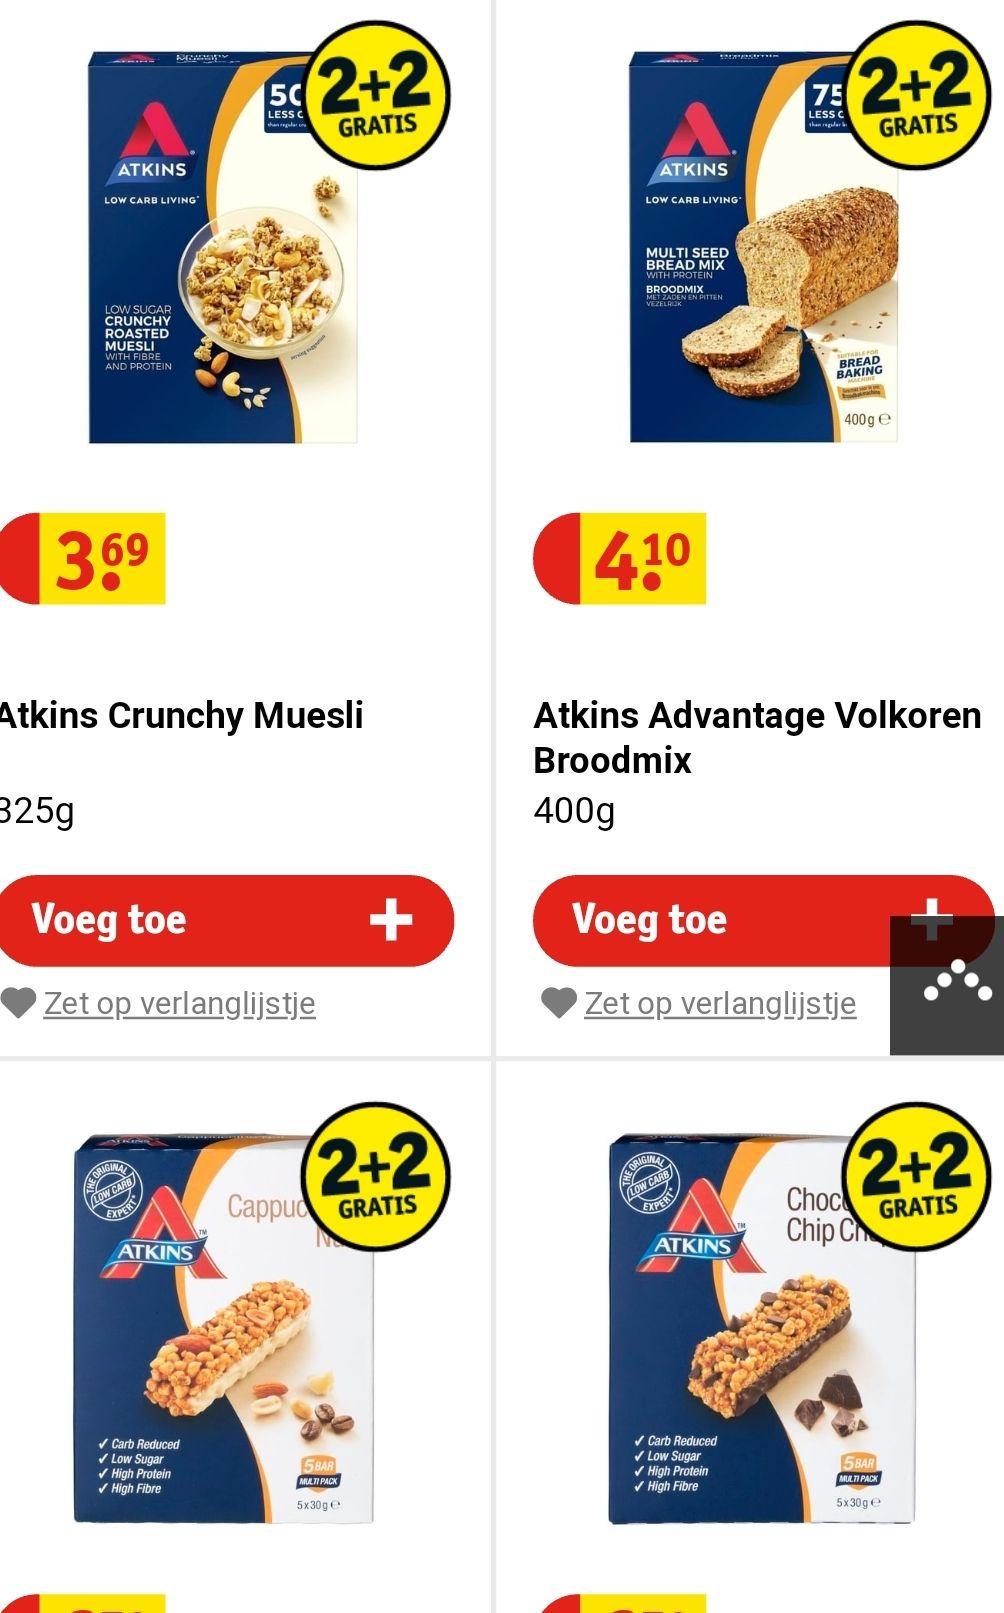 Alles van Atkins 2+2 gratis online @Kruidvat